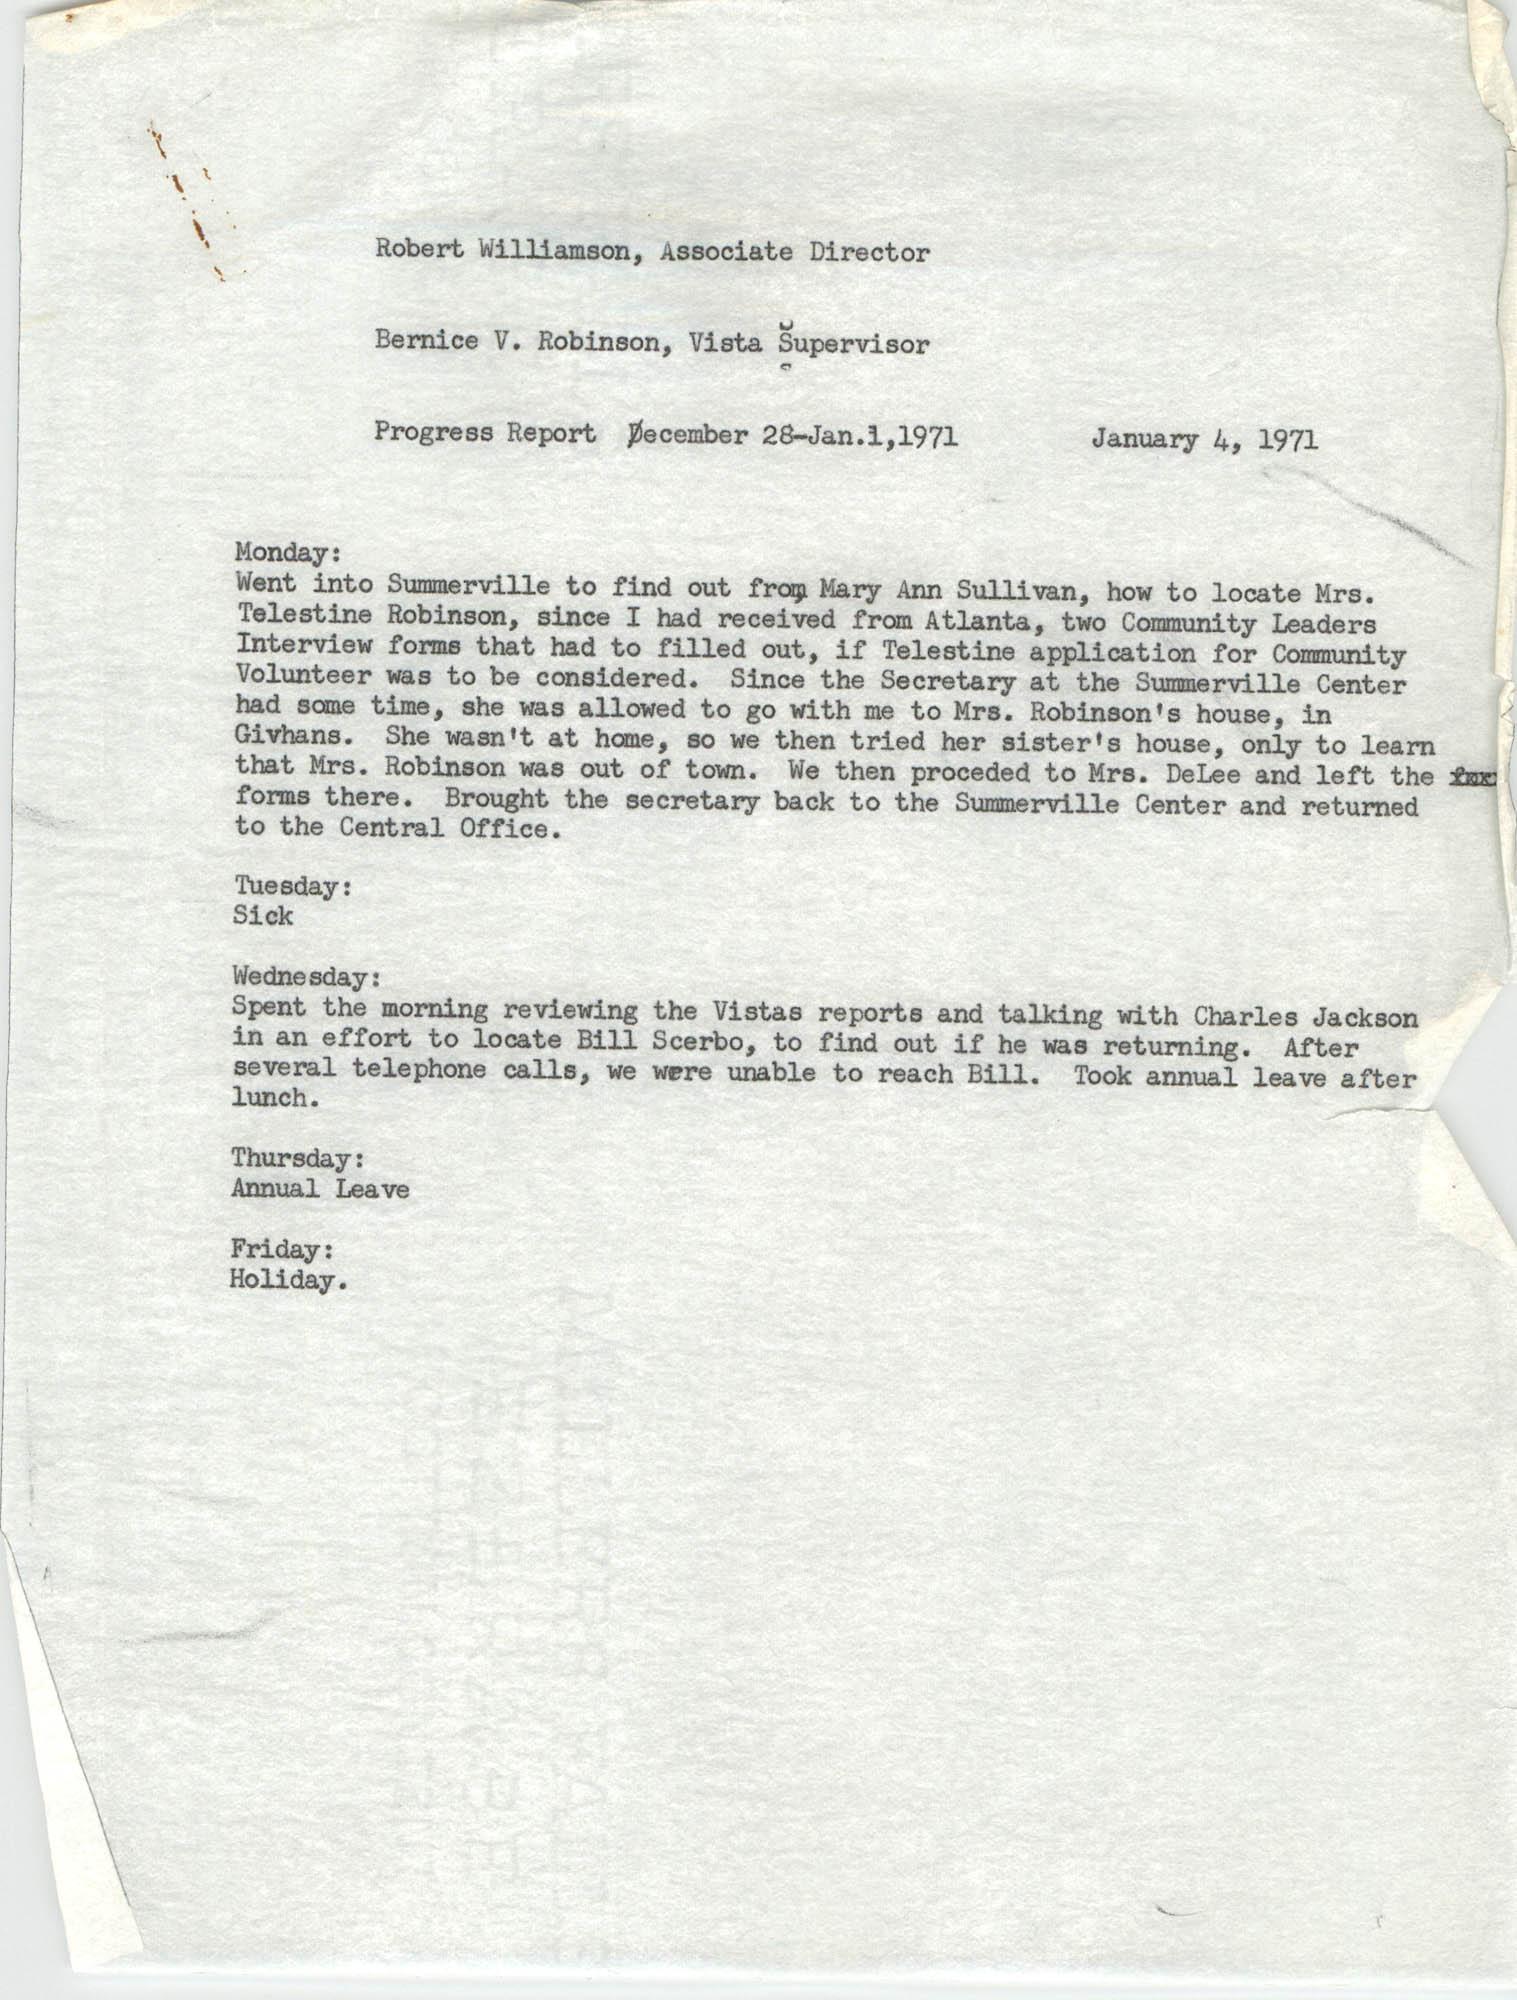 Memorandum from Bernice V. Robinson to Robert Williamson, January 4, 1971